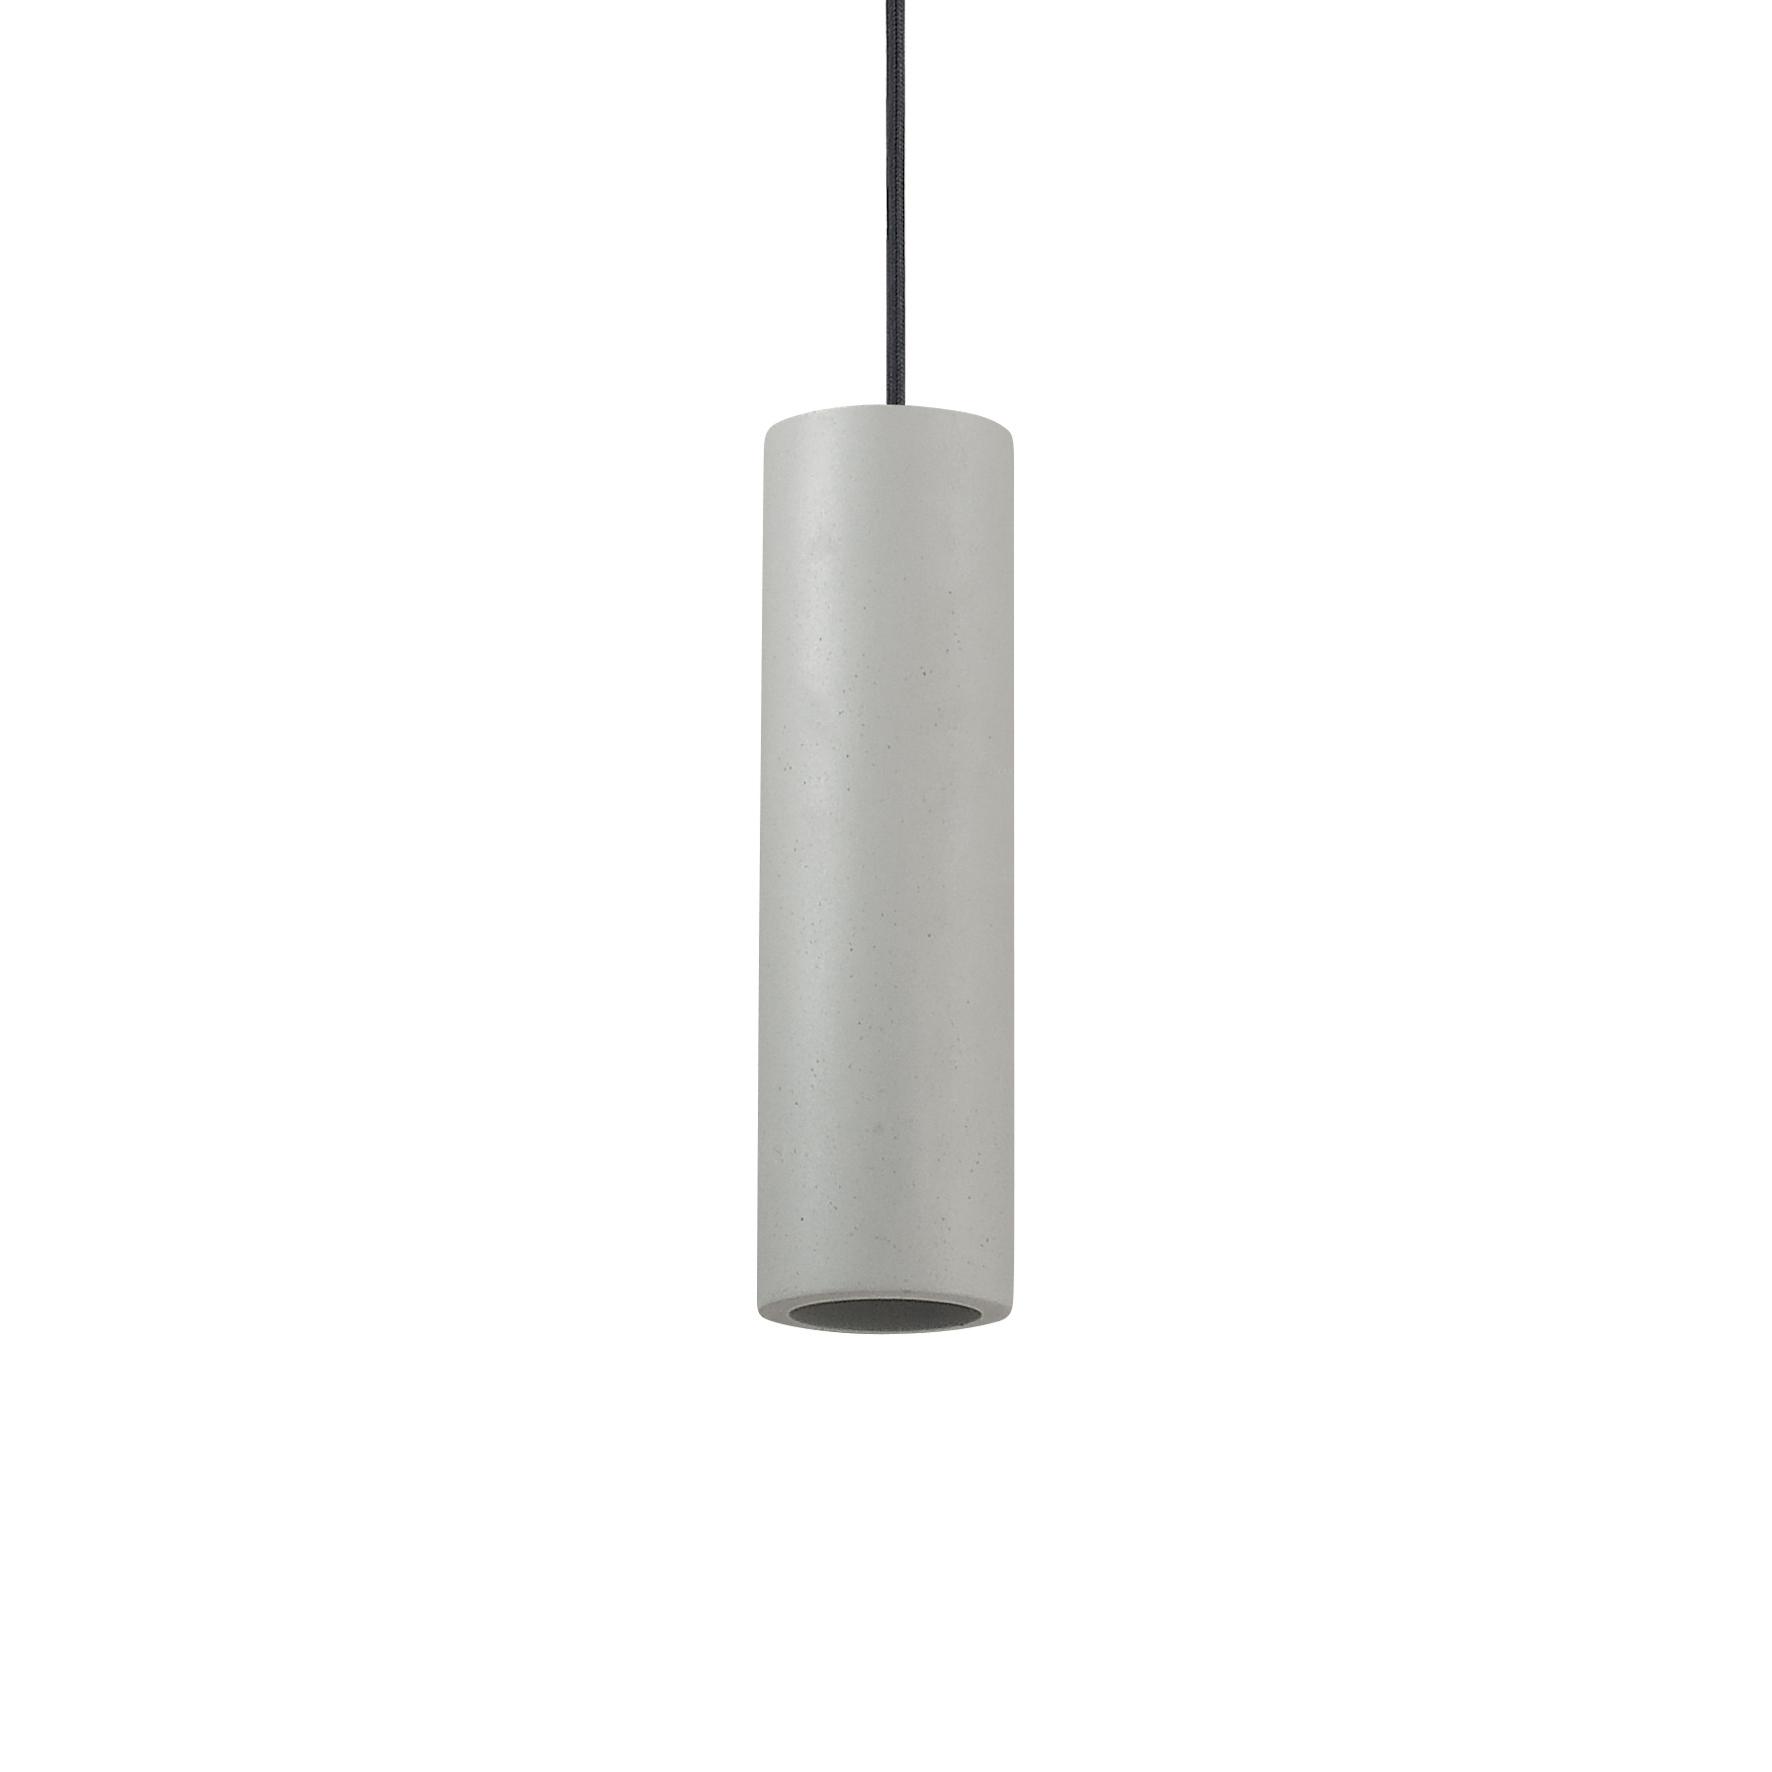 Lustra Oak SP1 Round Cement